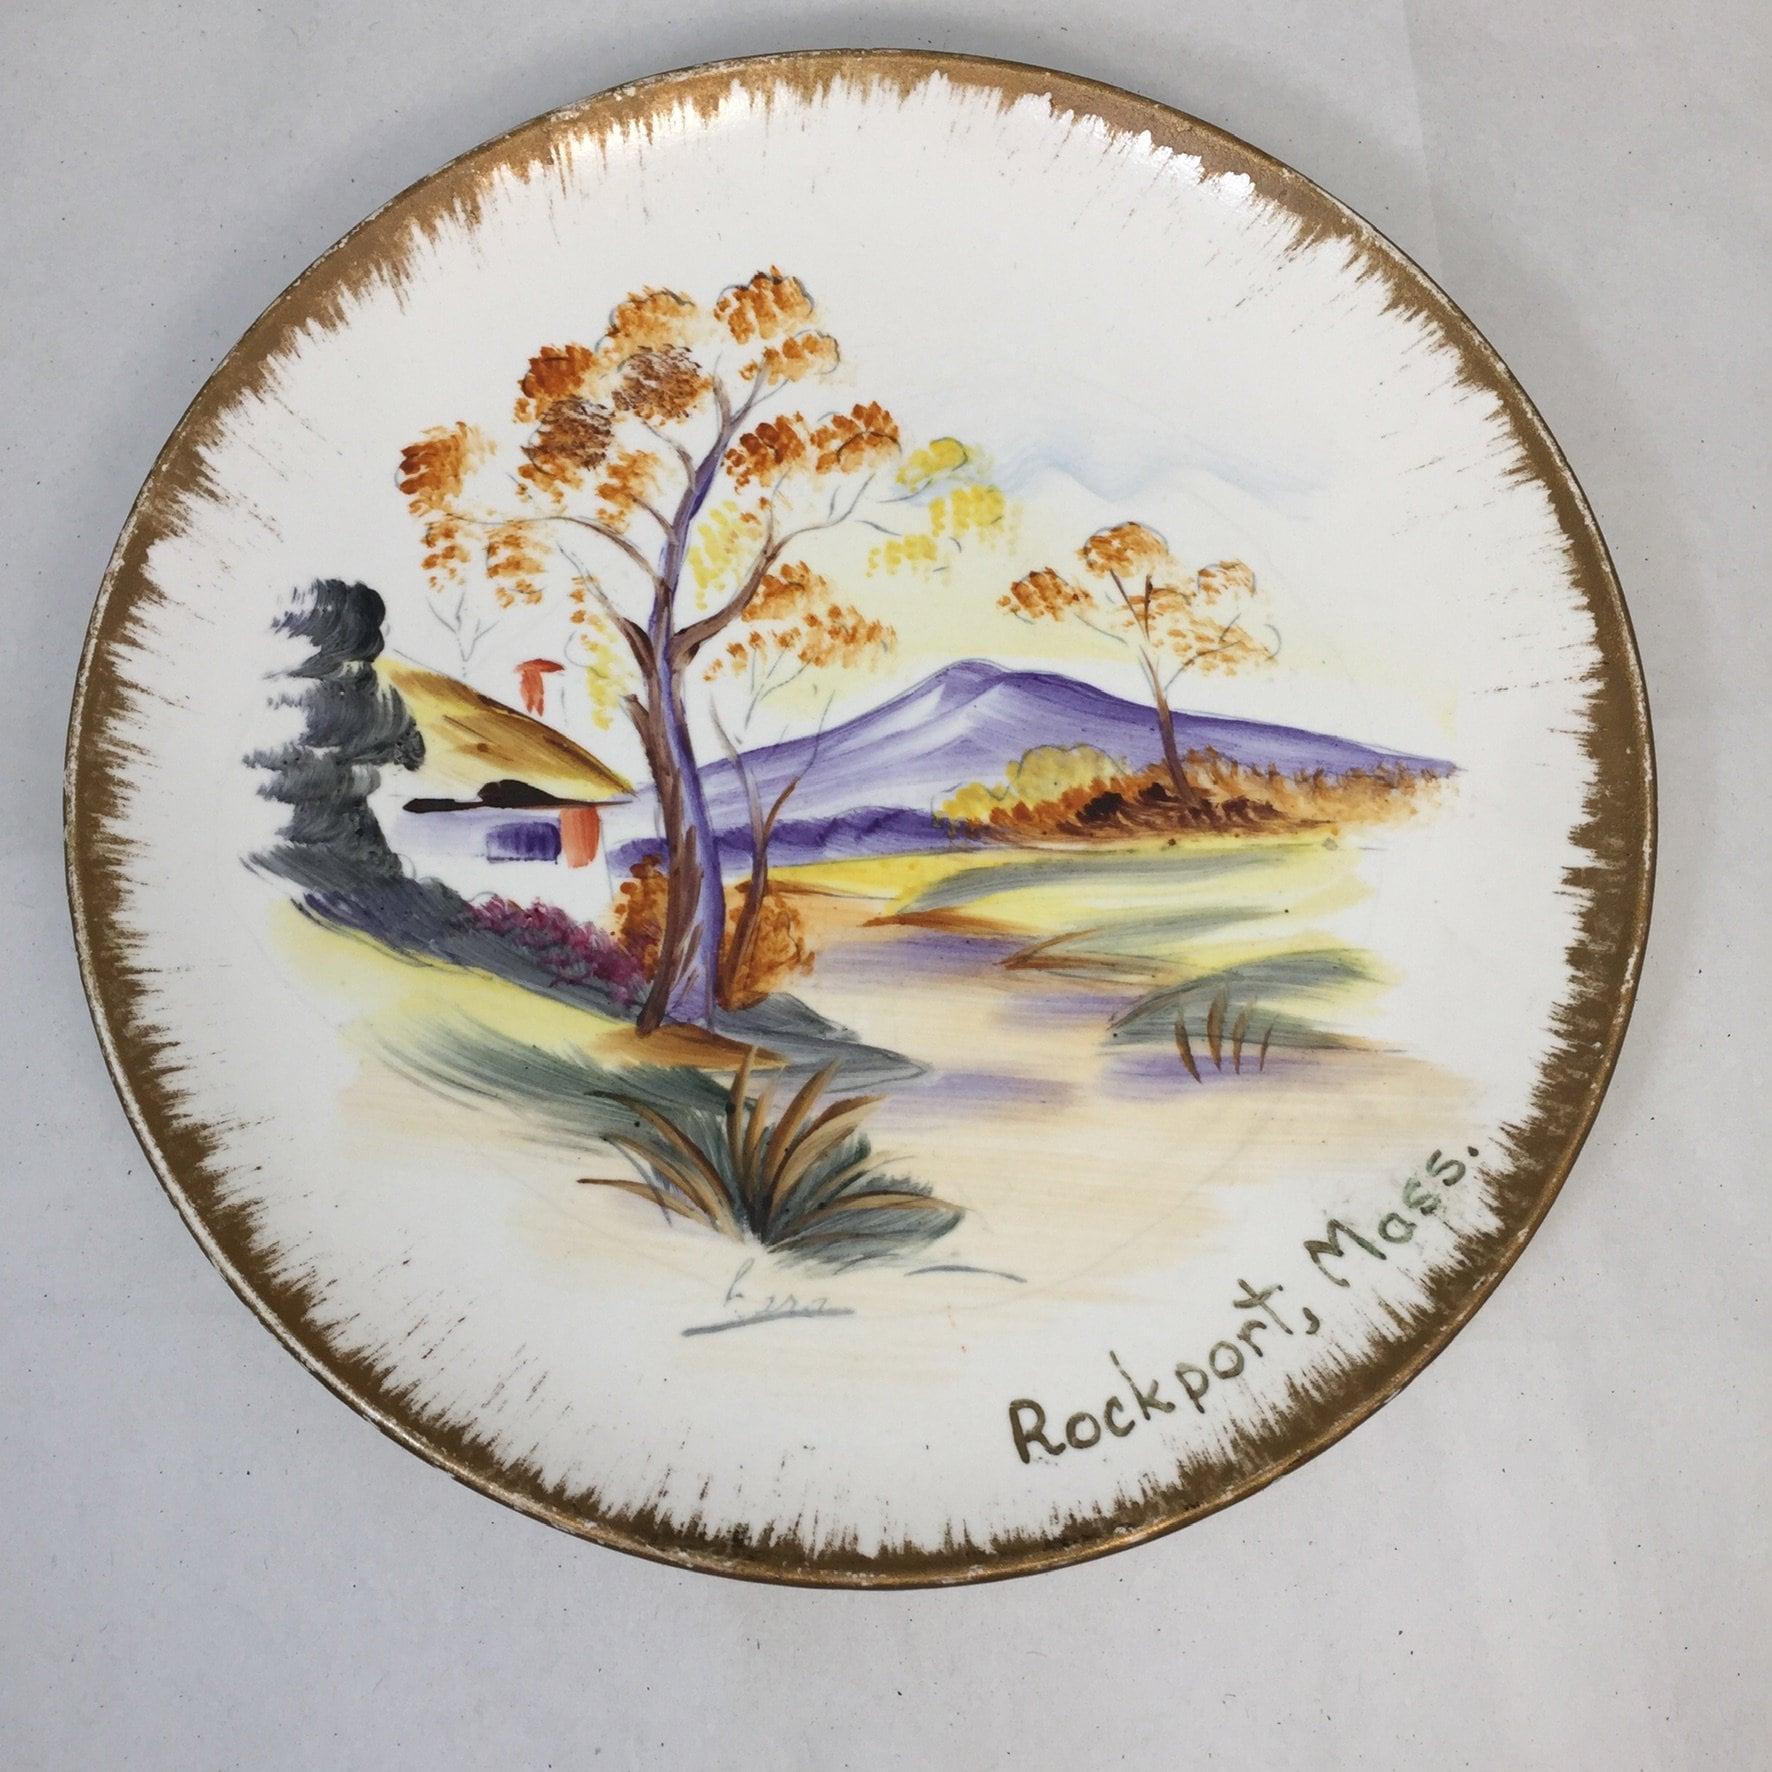 Vintage Rockport Massachusetts Souvenir Plate